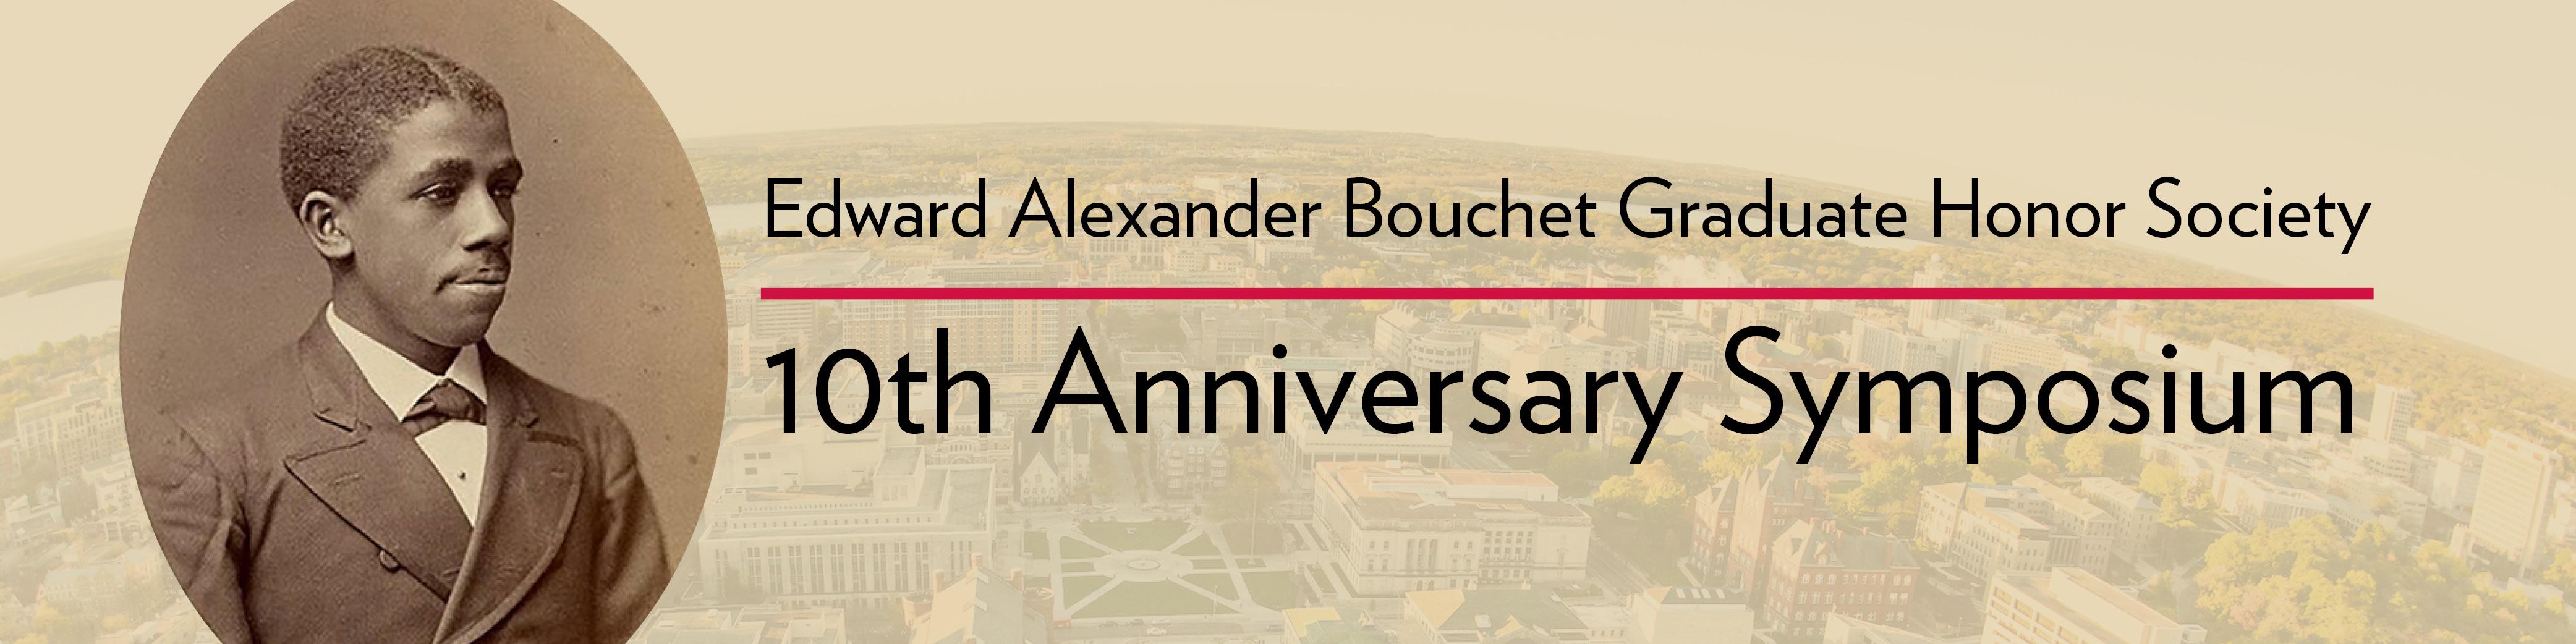 Edward Alexander Bouchet Graduate Honor Society 10th Anniversary Symposium